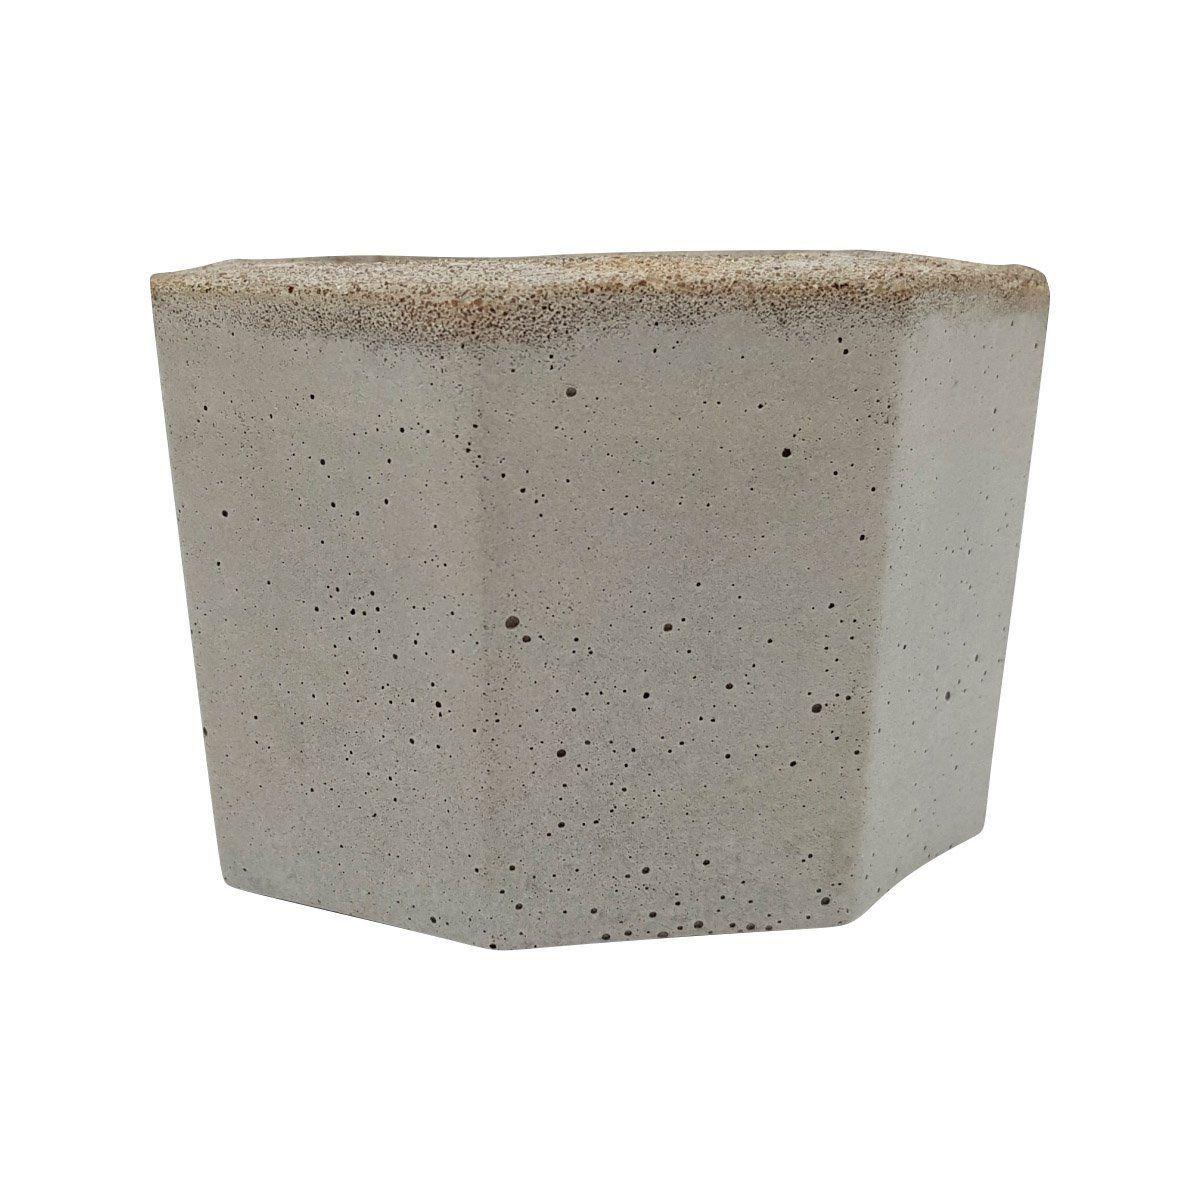 Vaso de cimento 5cm x 8cm MD13